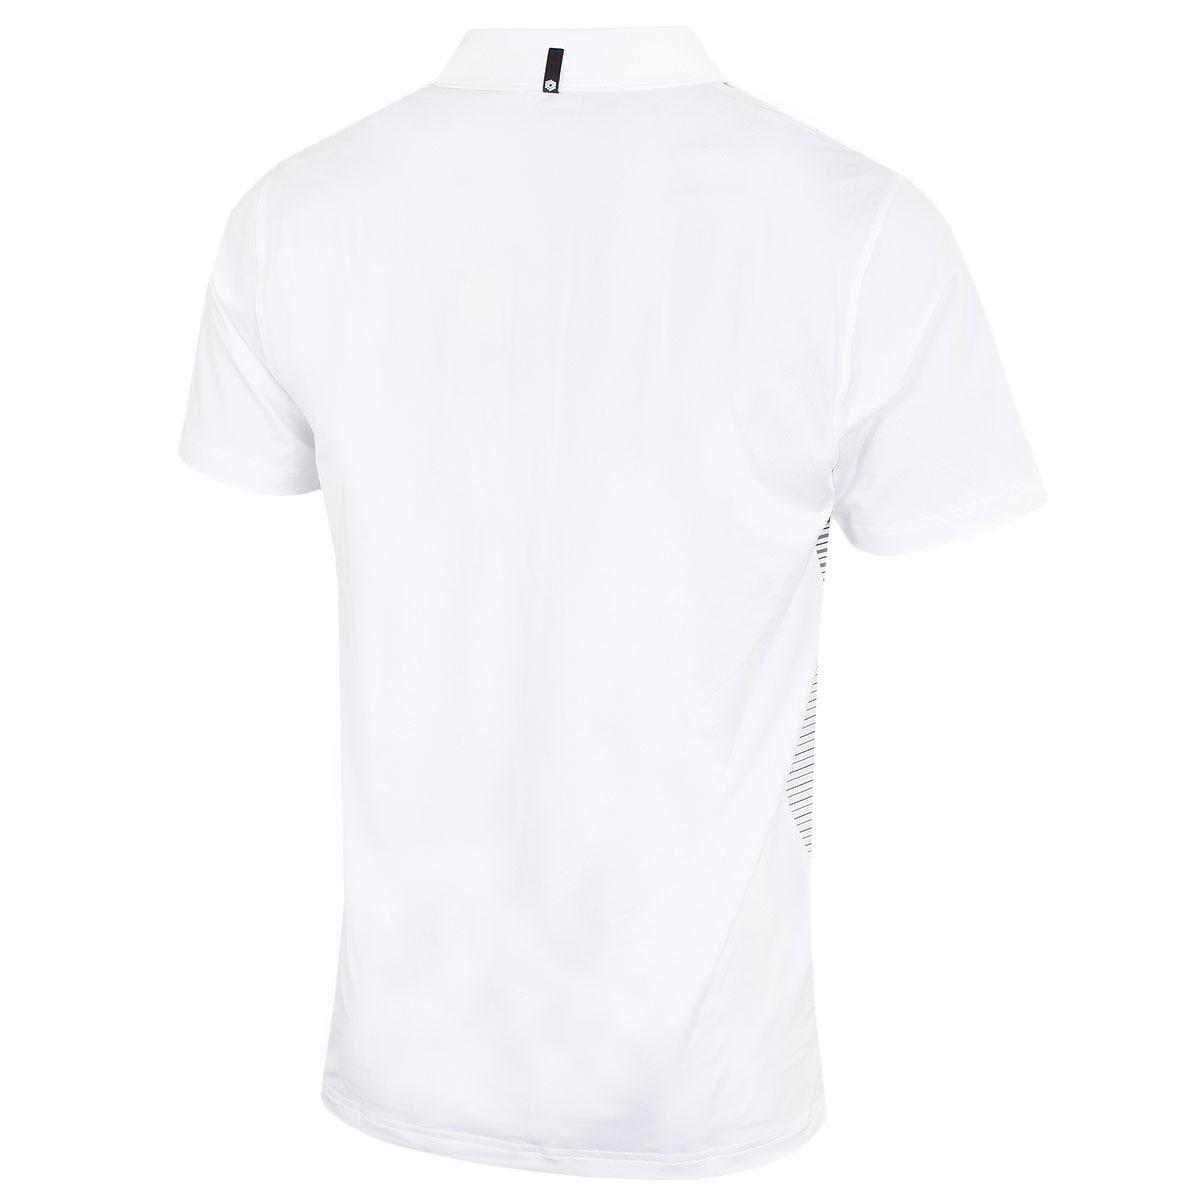 Puma-Golf-Mens-Highlight-Stripe-DryCELL-UPF-40-Stretch-Polo-Shirt thumbnail 3